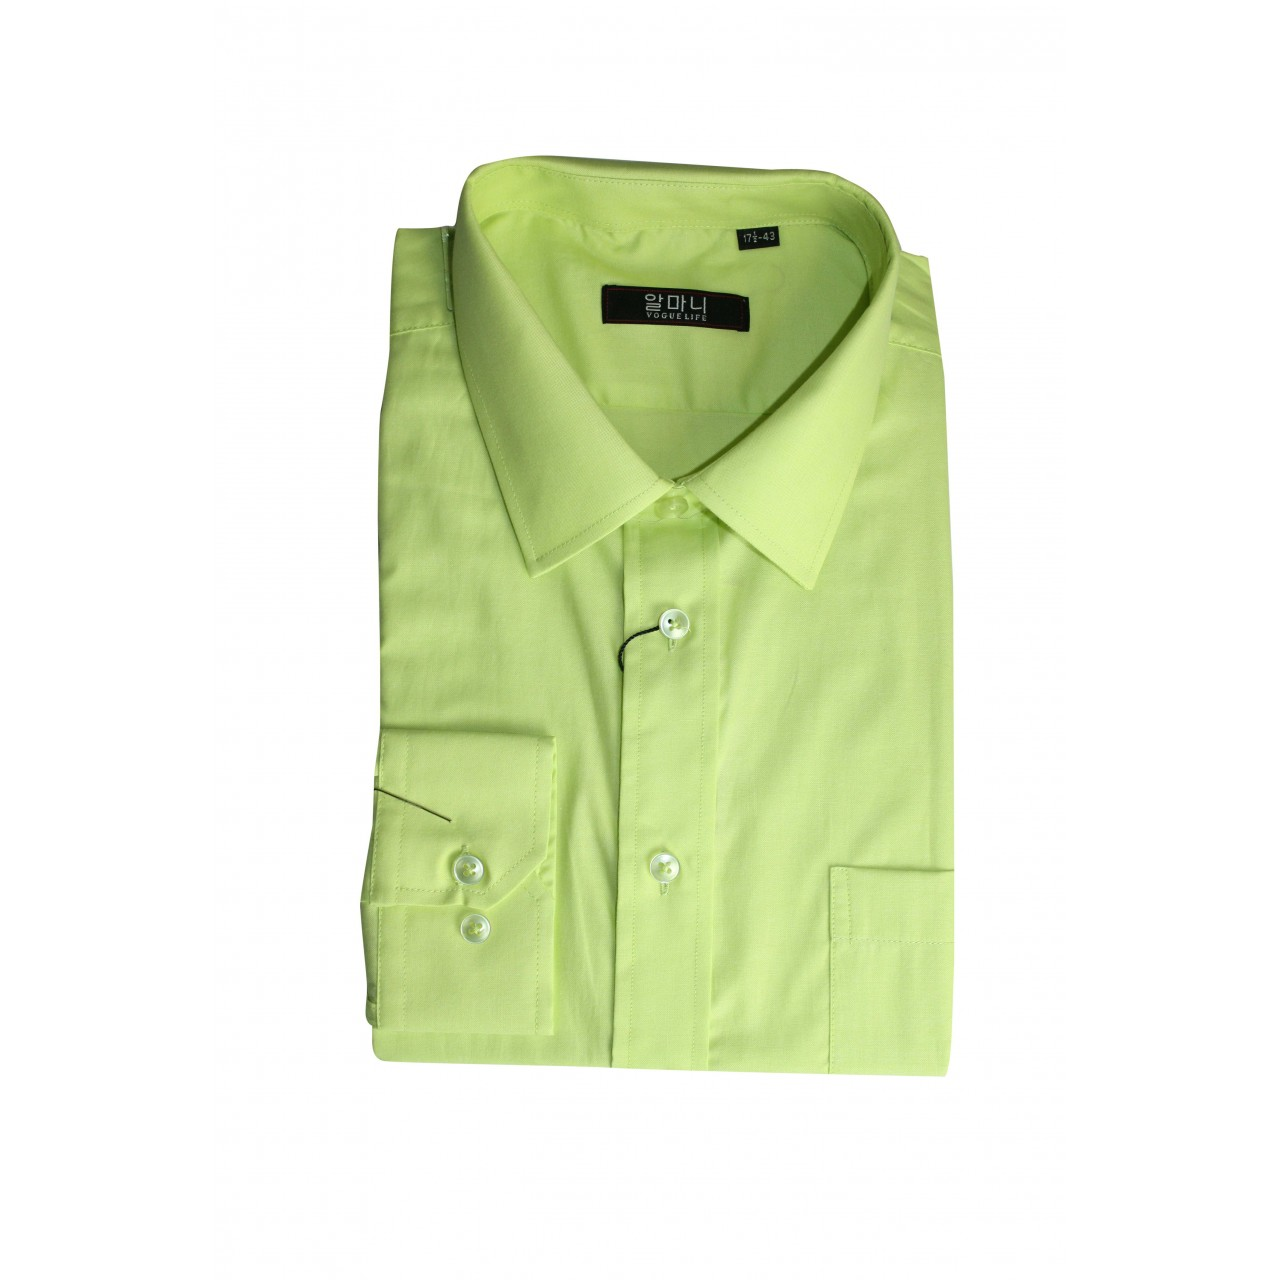 Men's Formal basic VOGUE LIFE Light green shirt Set